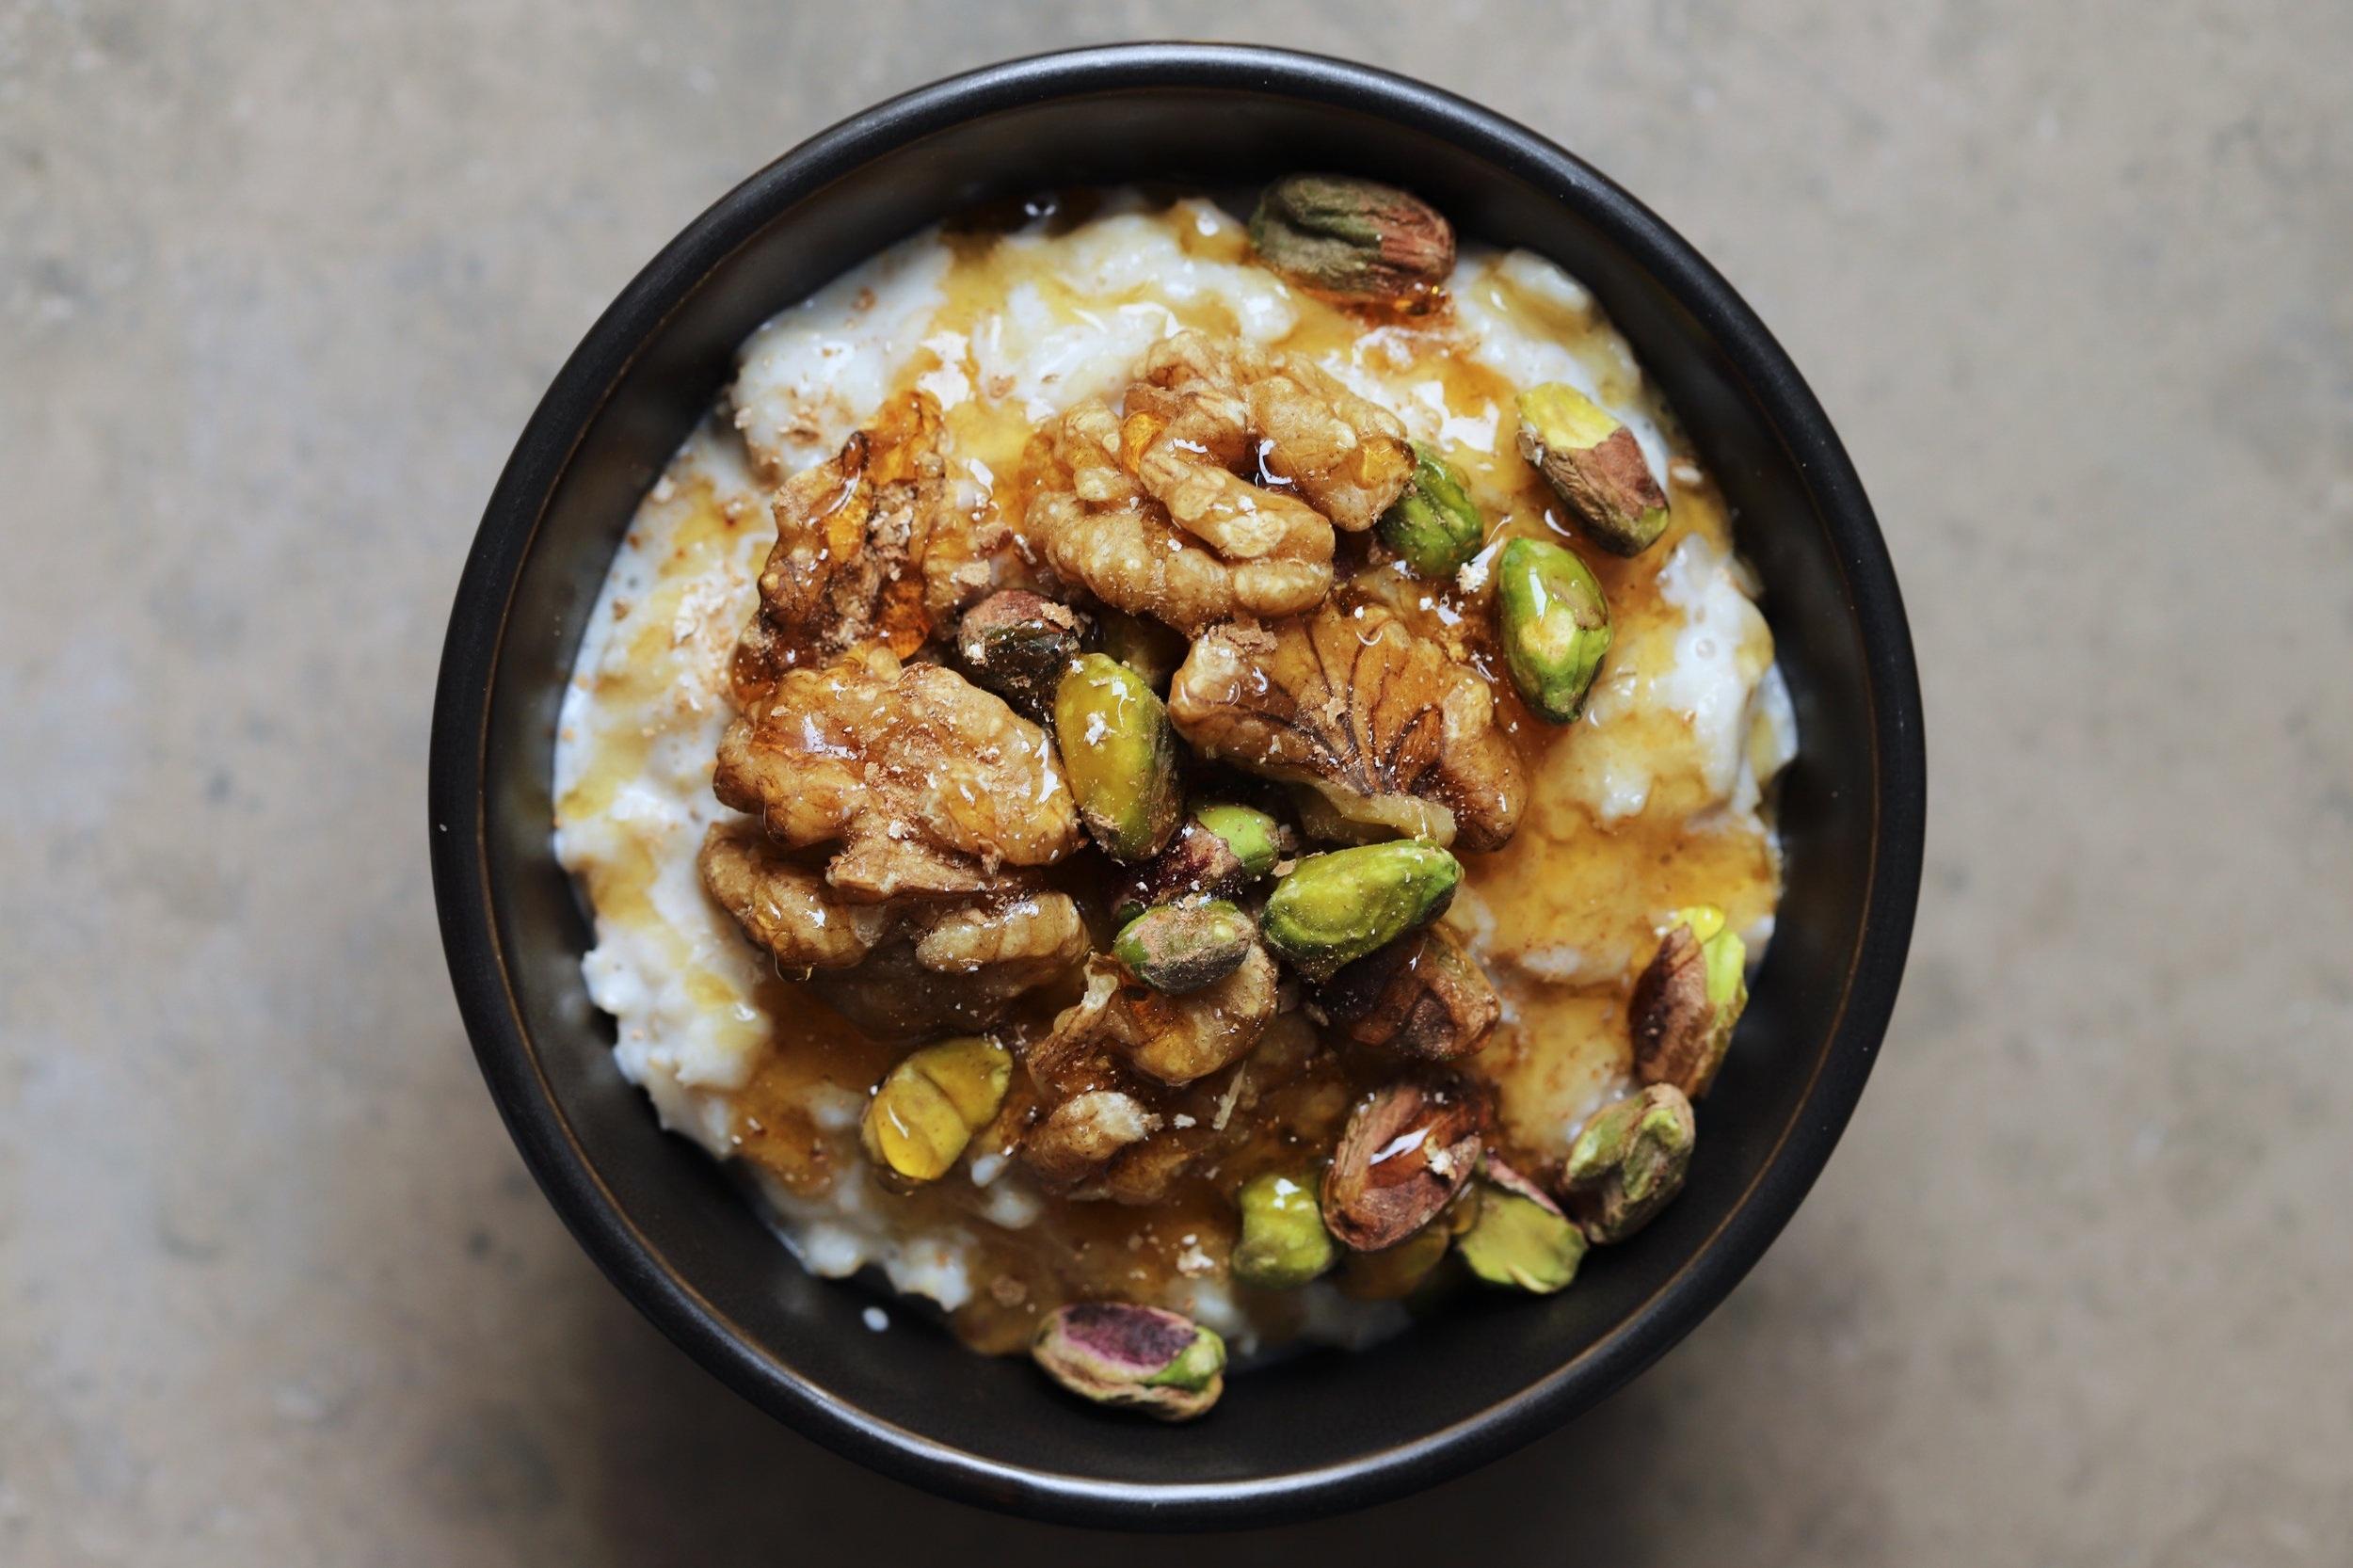 oatmeal 4 ways